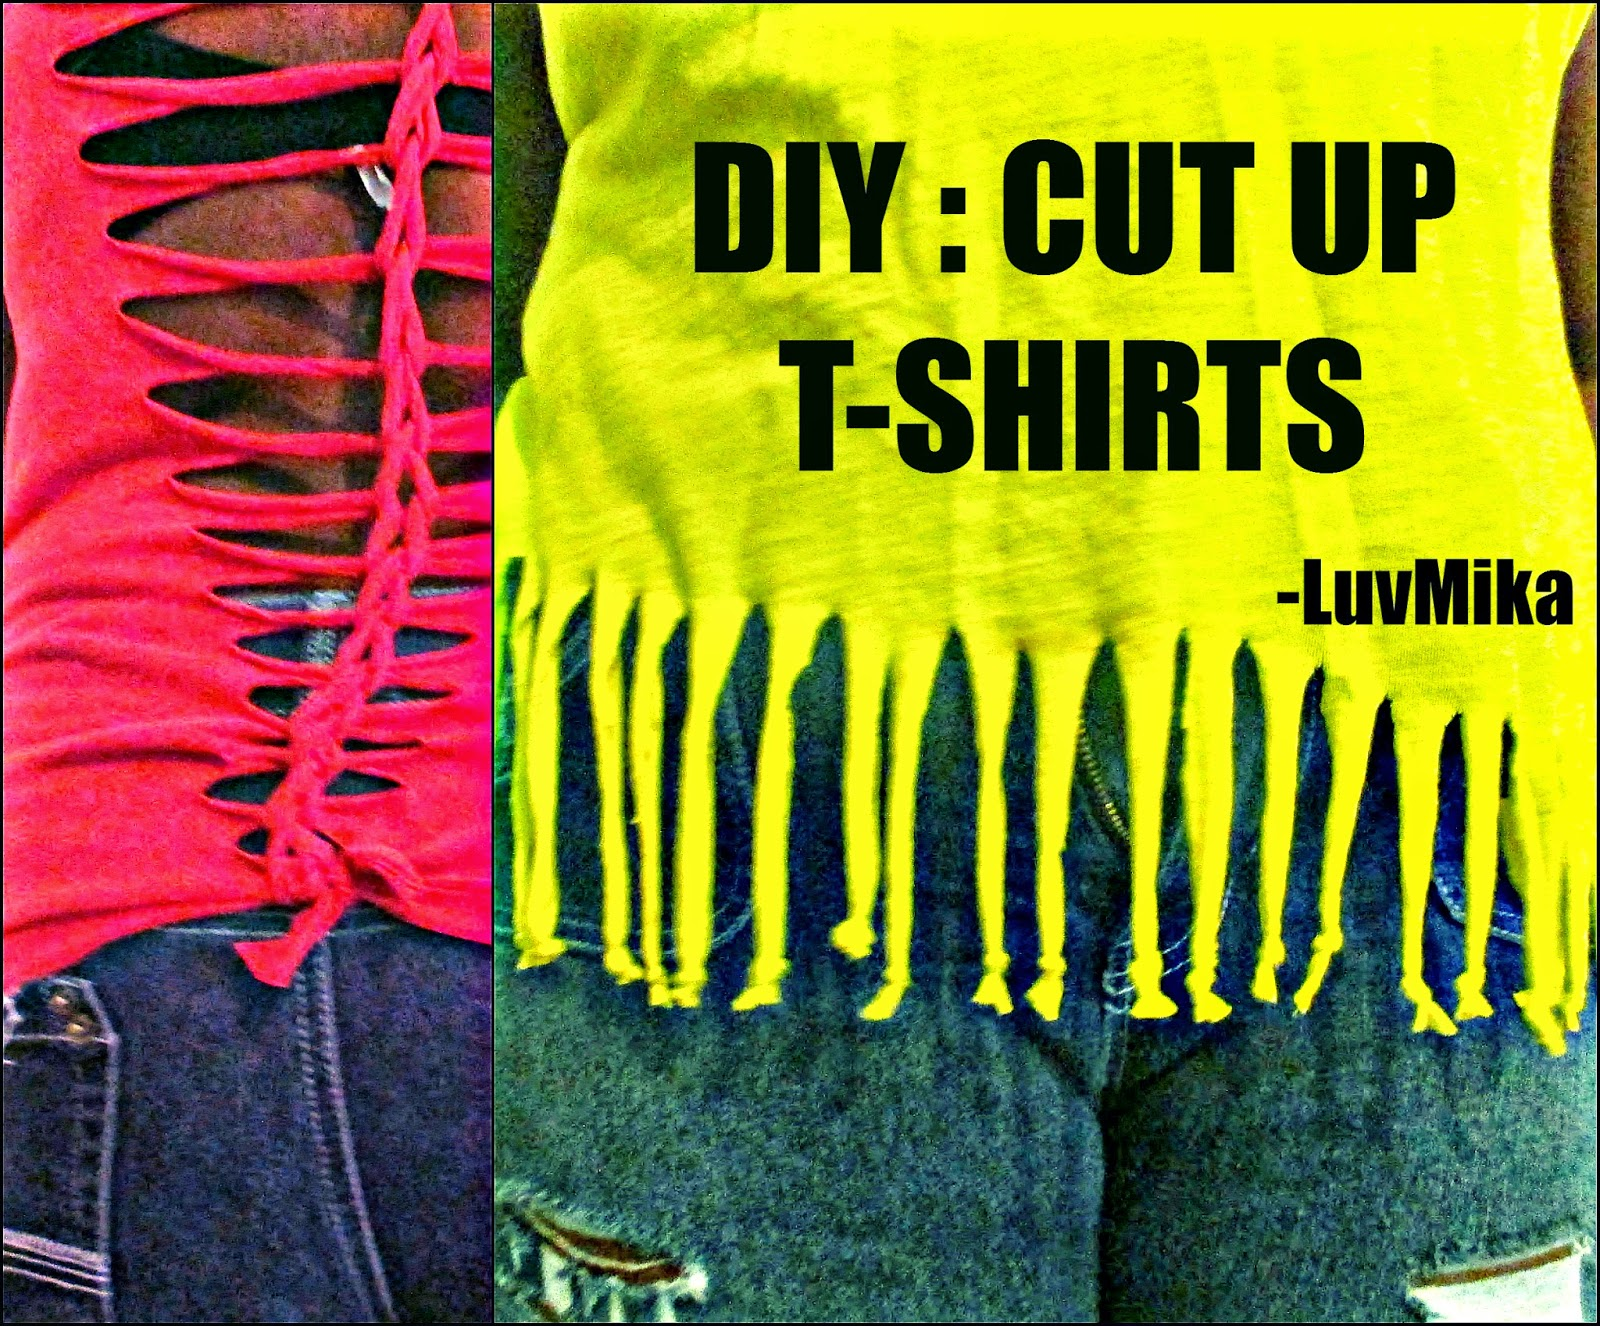 LuvMika 87: DIY: CUT UP T SHIRTS